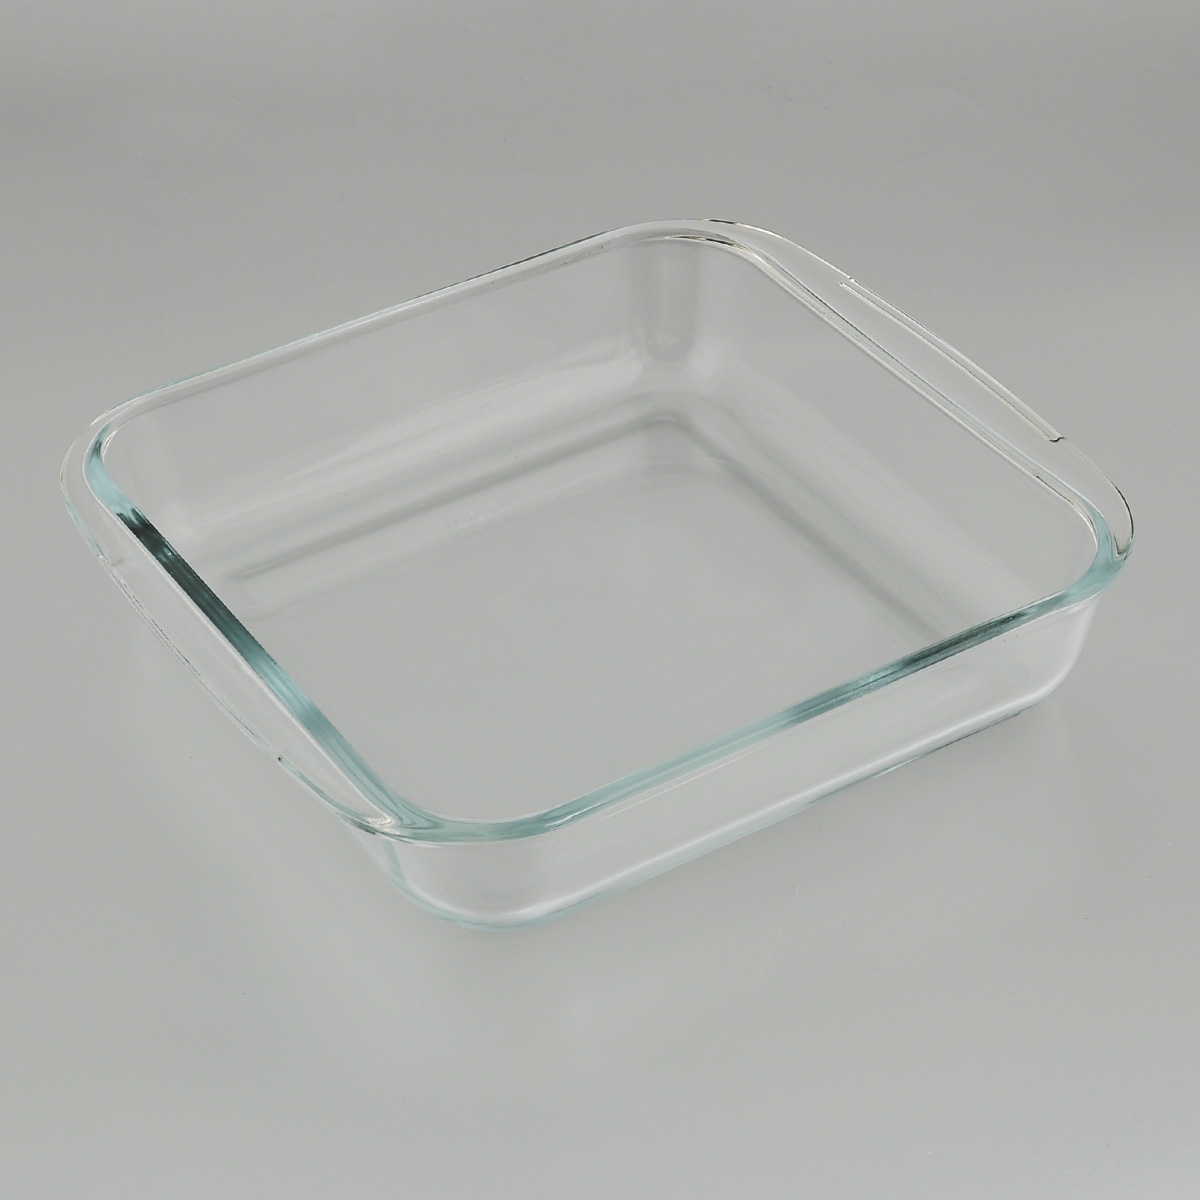 Форма для запекания Mijotex, квадратная, 24 х 22 см emile henry квадратная форма для запекания 2 05 л 28x23 см крем